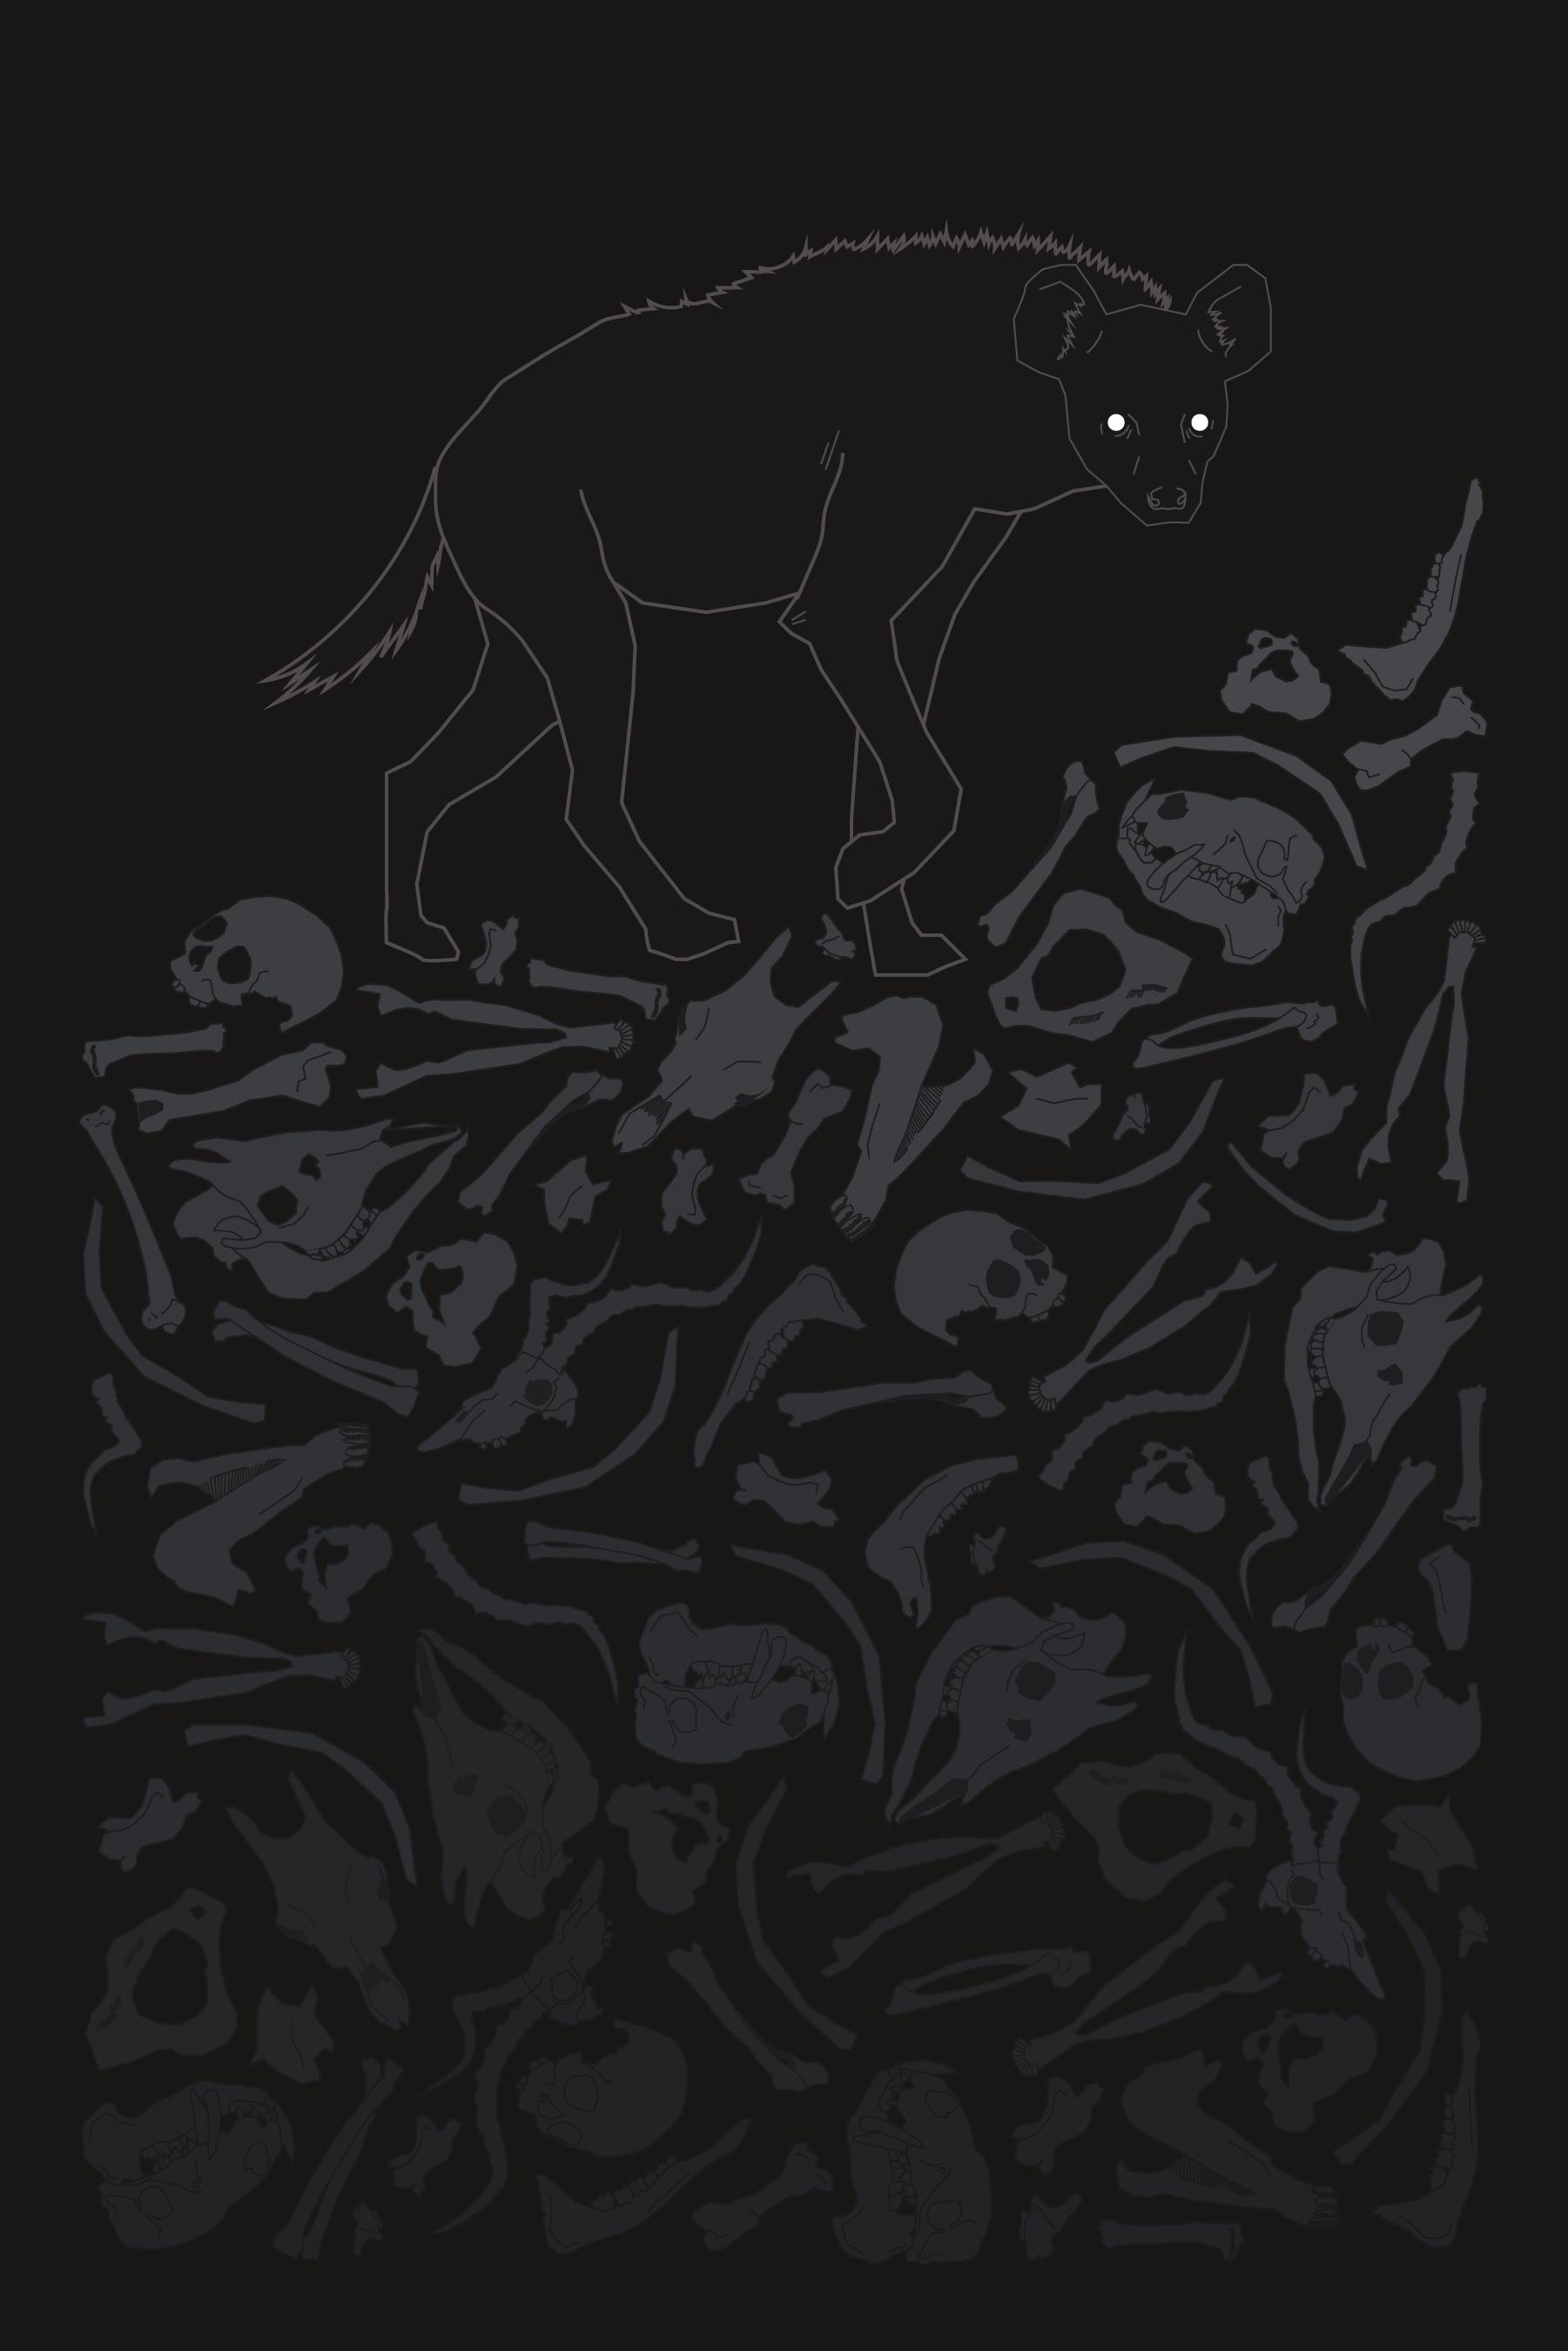 hyena 6x9-02.png